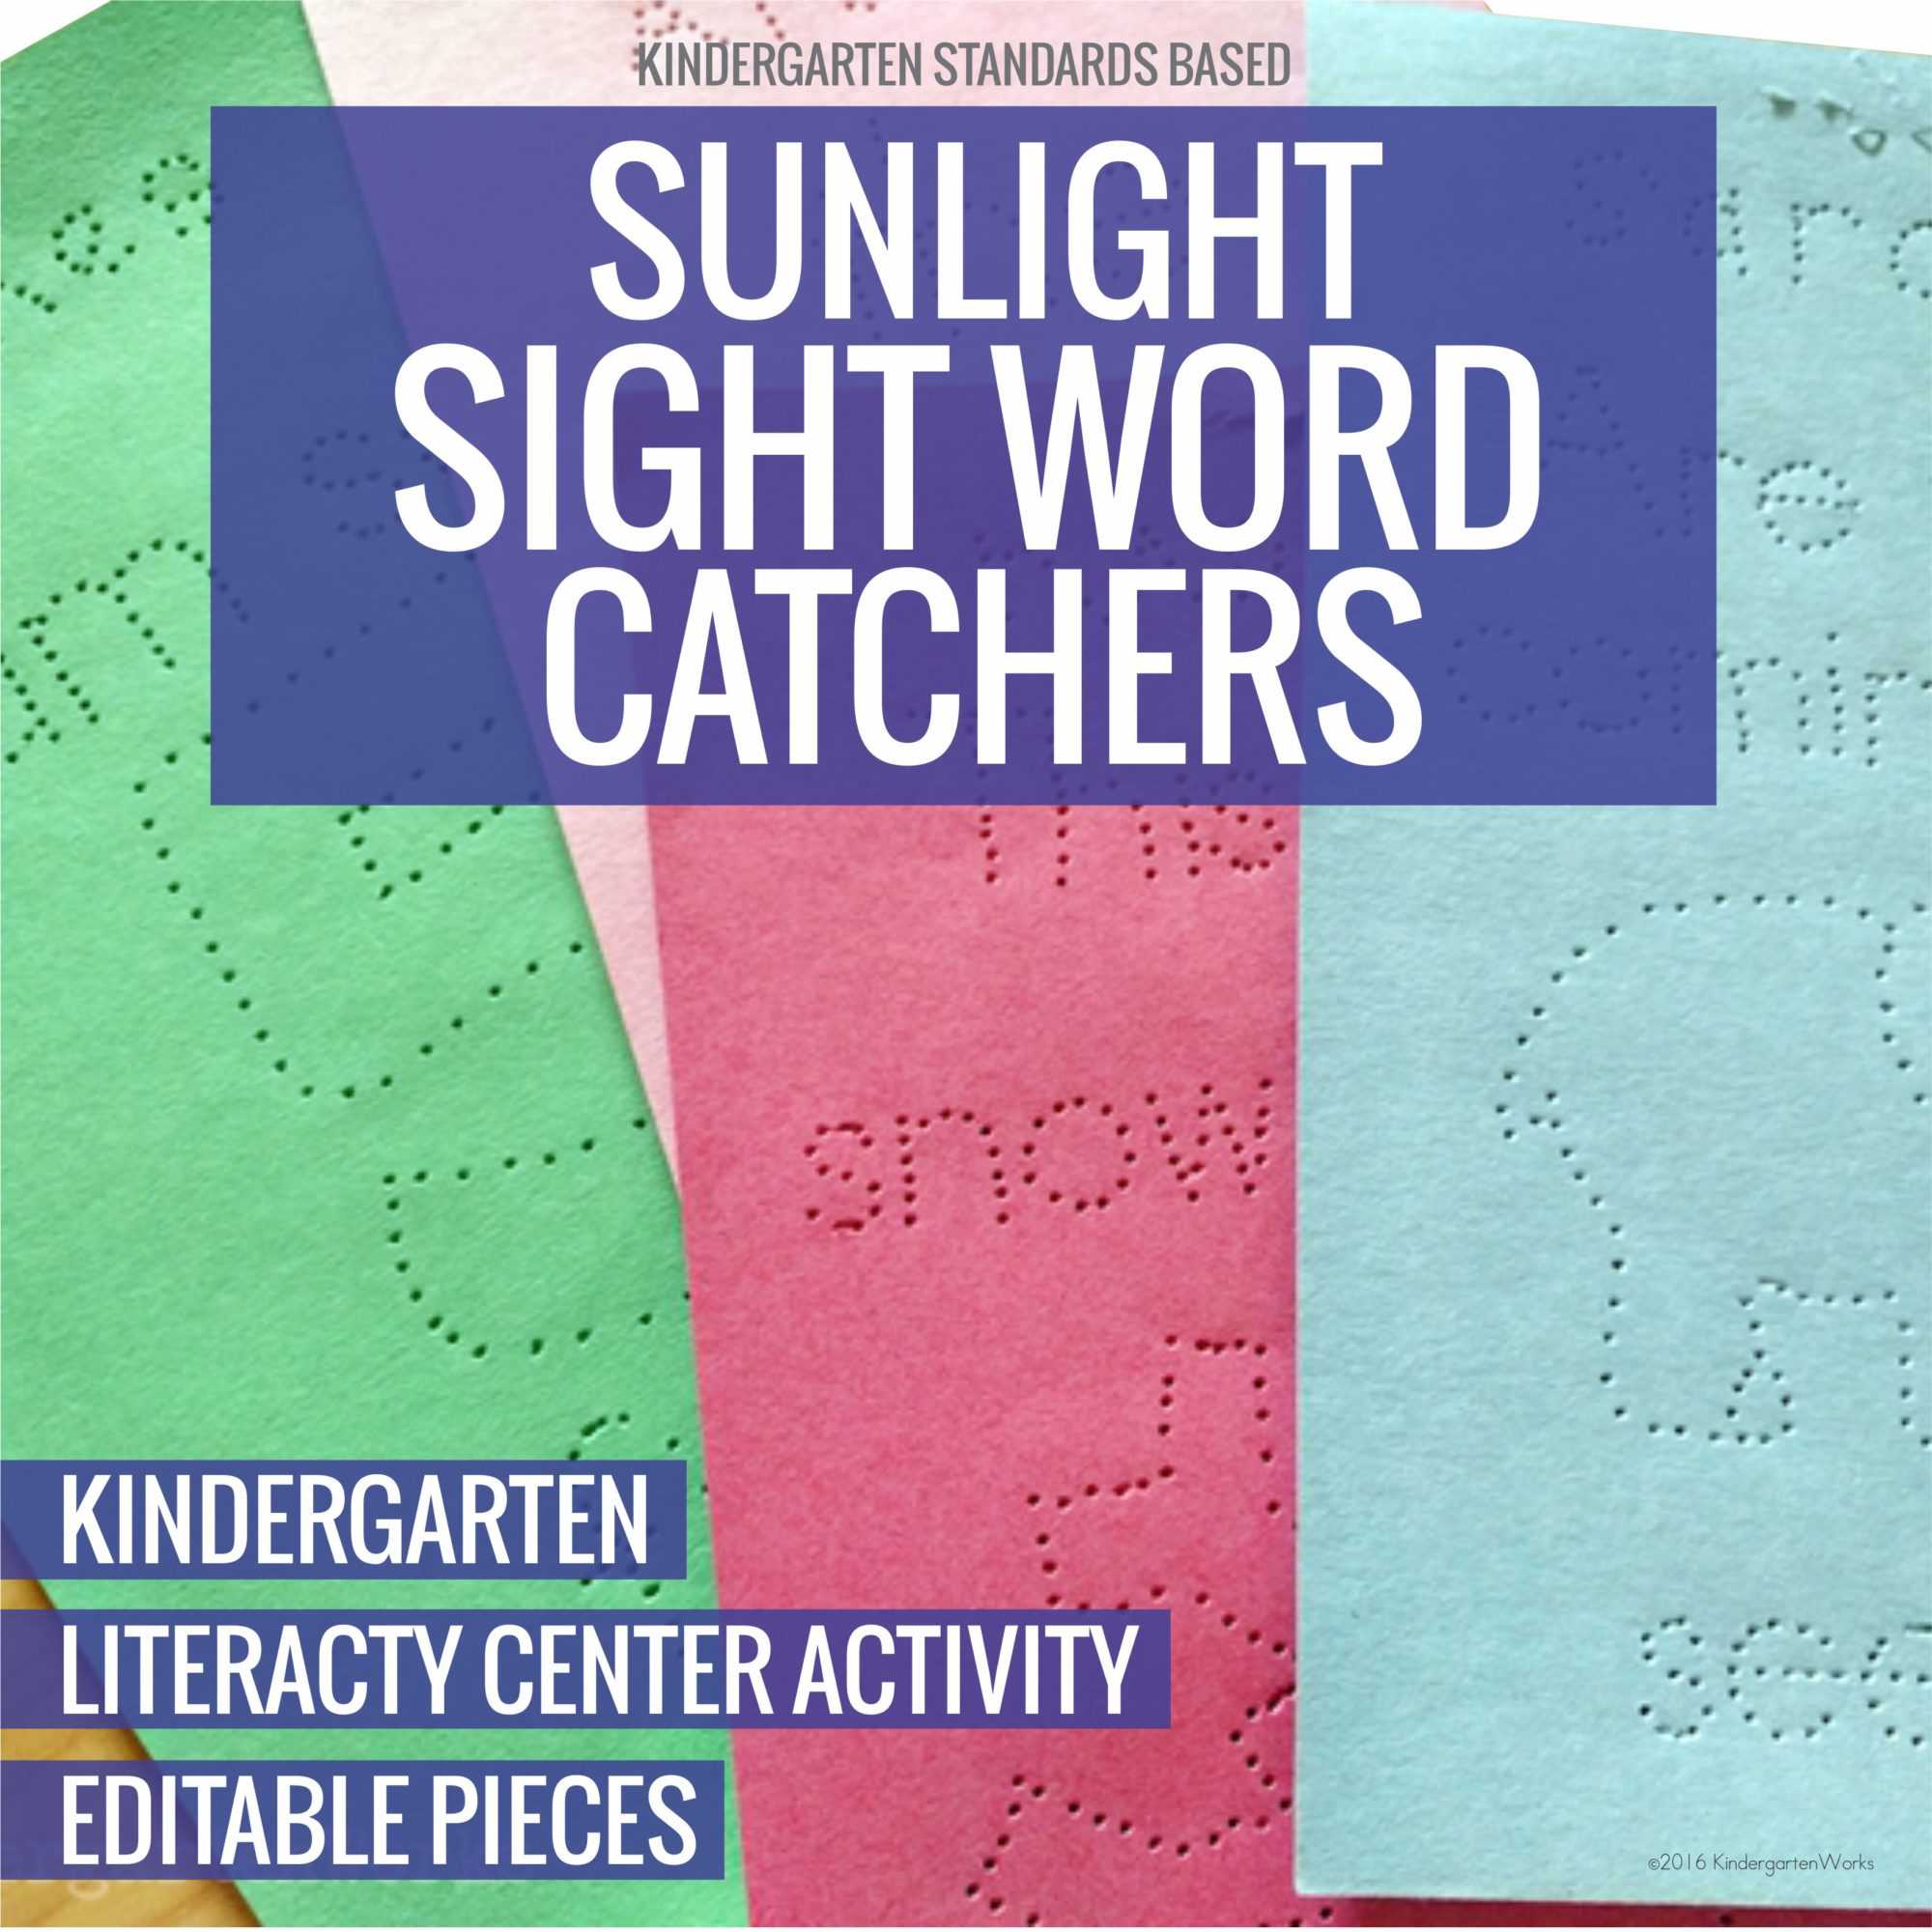 Pokey Pinning Sunlight Sight Word Catchers for Kindergarten